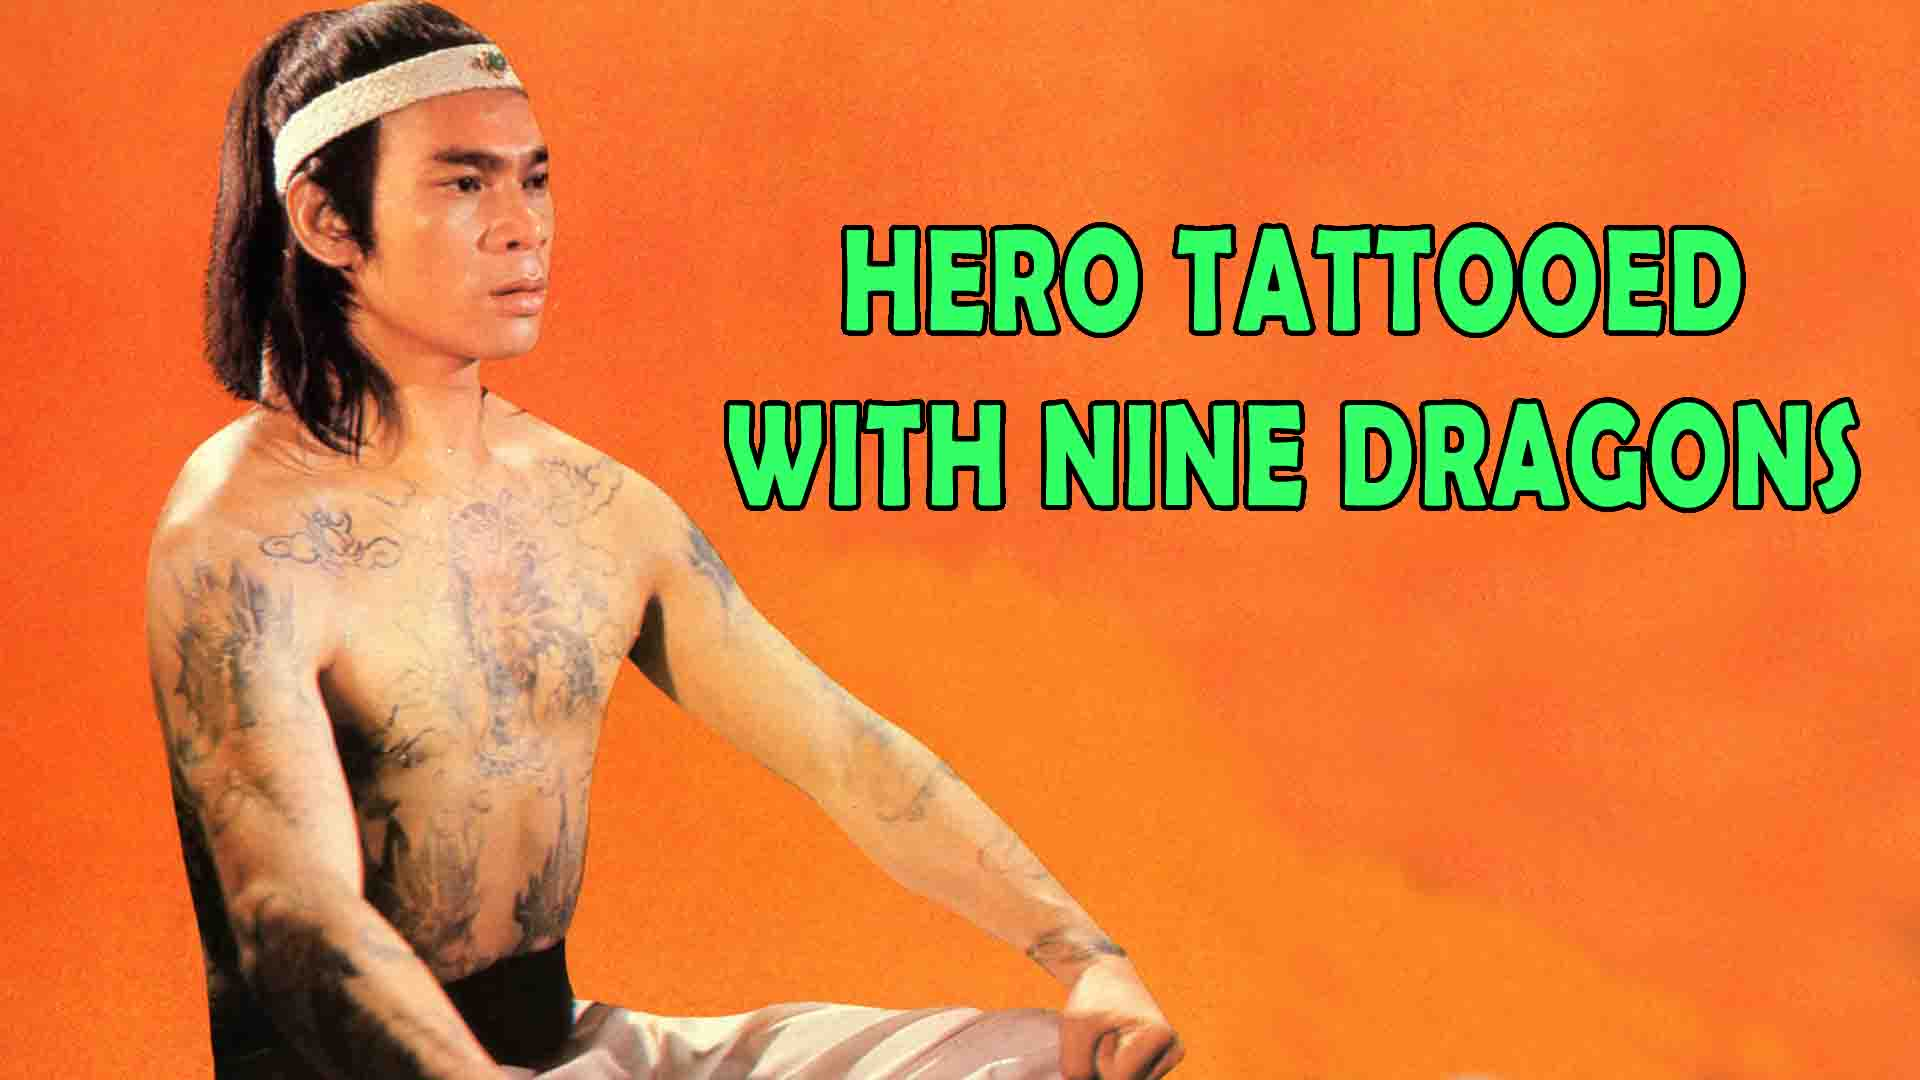 Hero Tattooed With Nine Dragons